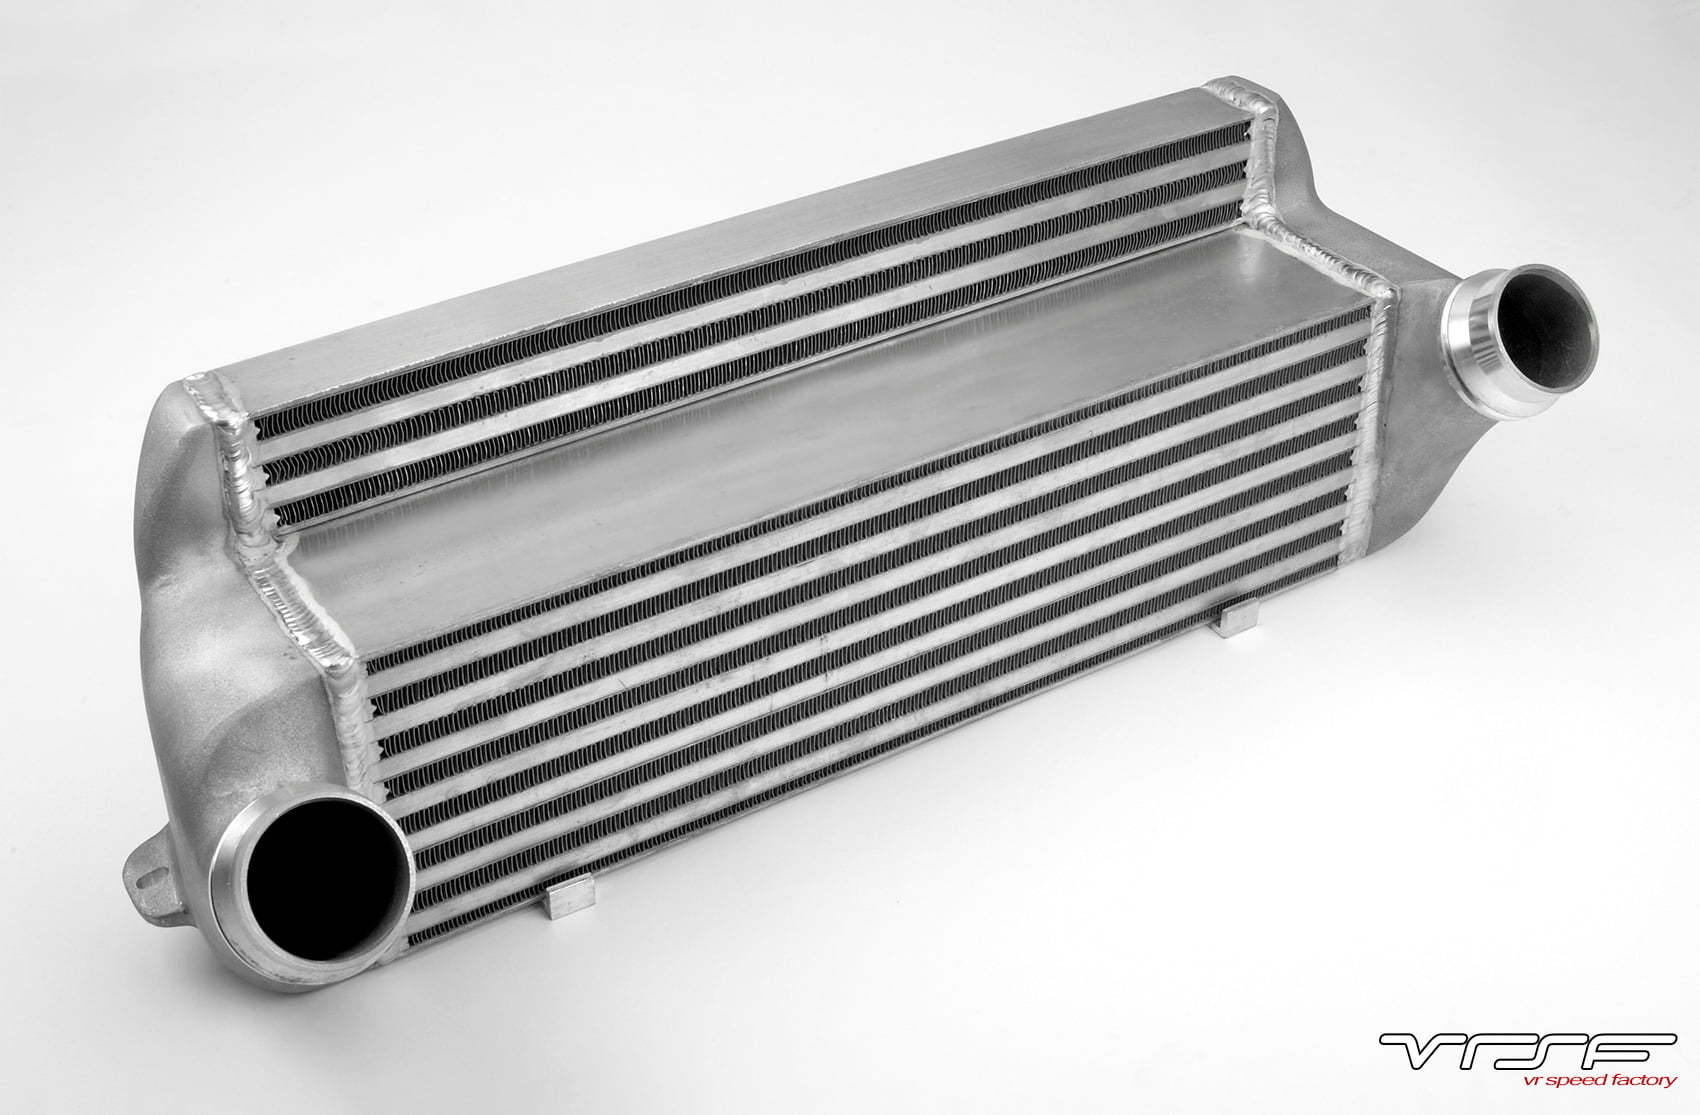 VRSF Chargepipe 12-16 BMW M2//M235i//335i//435i F20/&F30 N55 *XI ONLY* Auto /& Manual